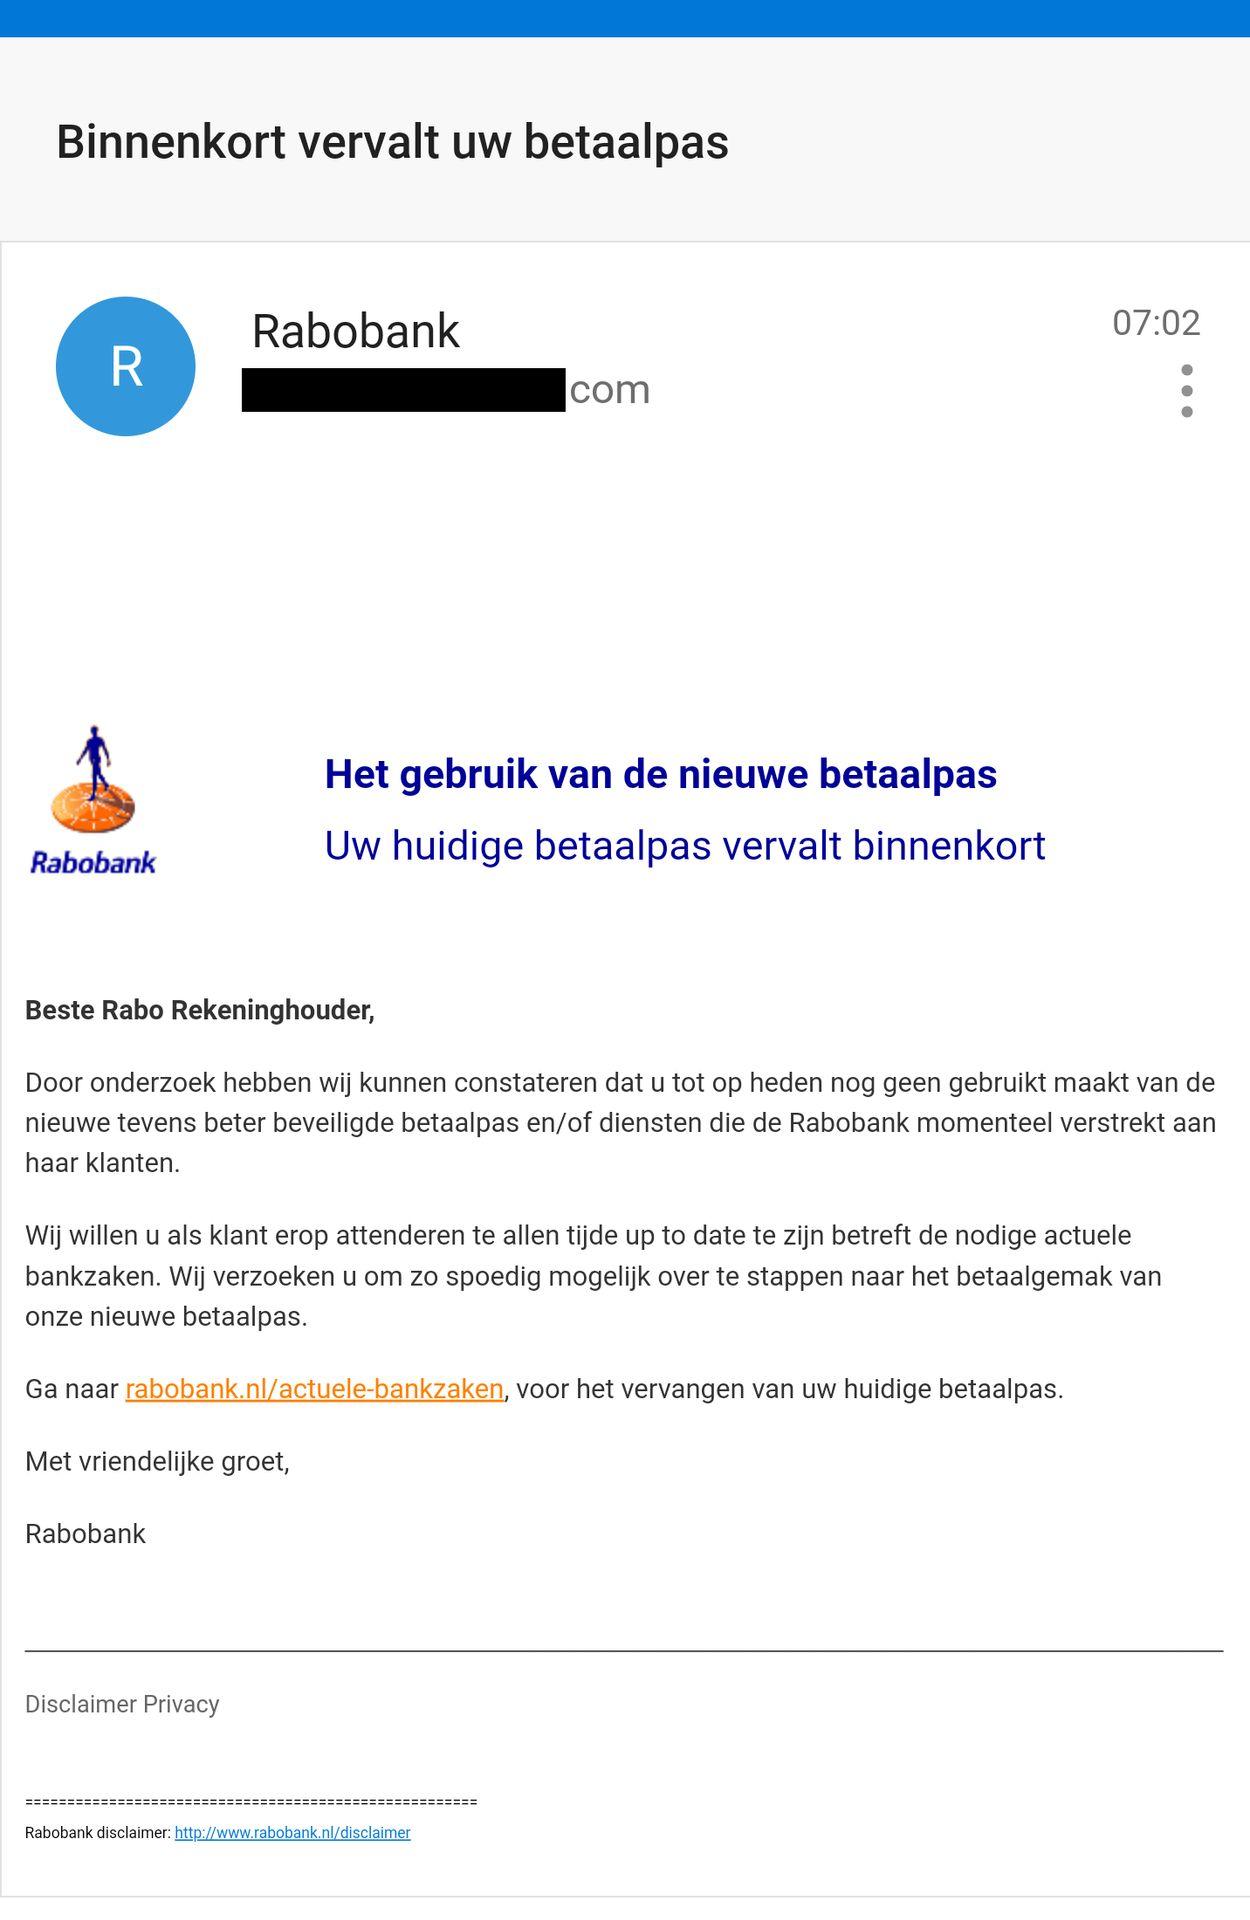 rabobank phishing betaalpas